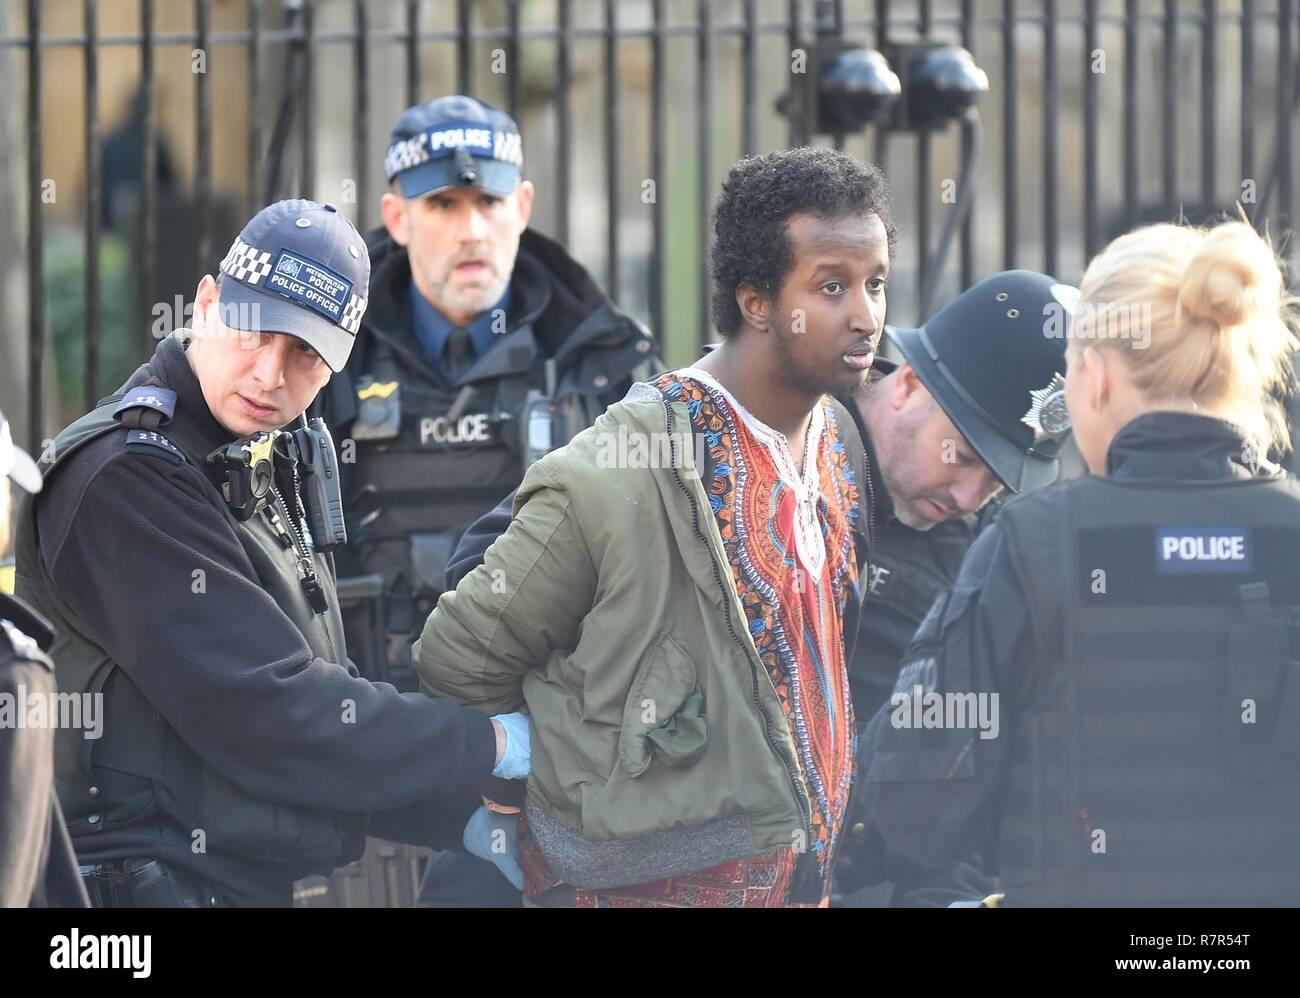 Intruder arrested inside the grounds of Parliament, Westminster, London Credit: Finnbarr Webster/Alamy Live News - Stock Image